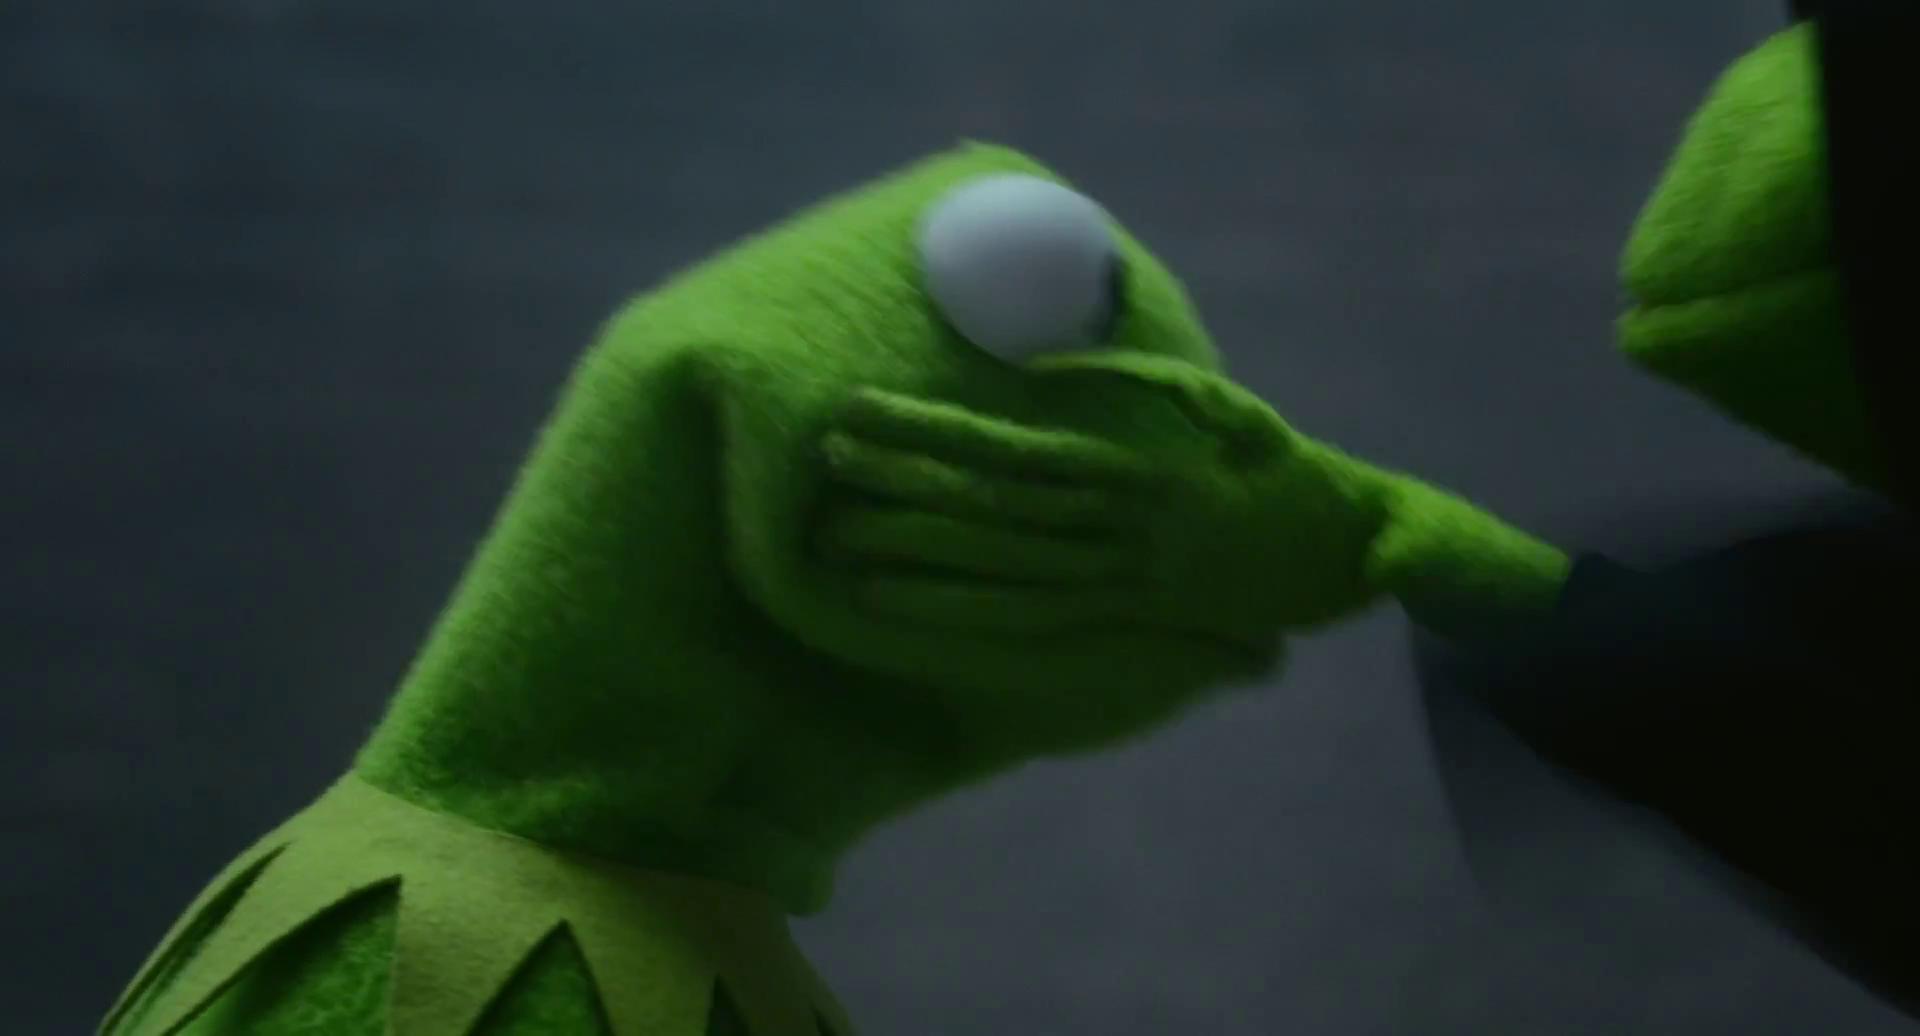 kermit the frog driving meme